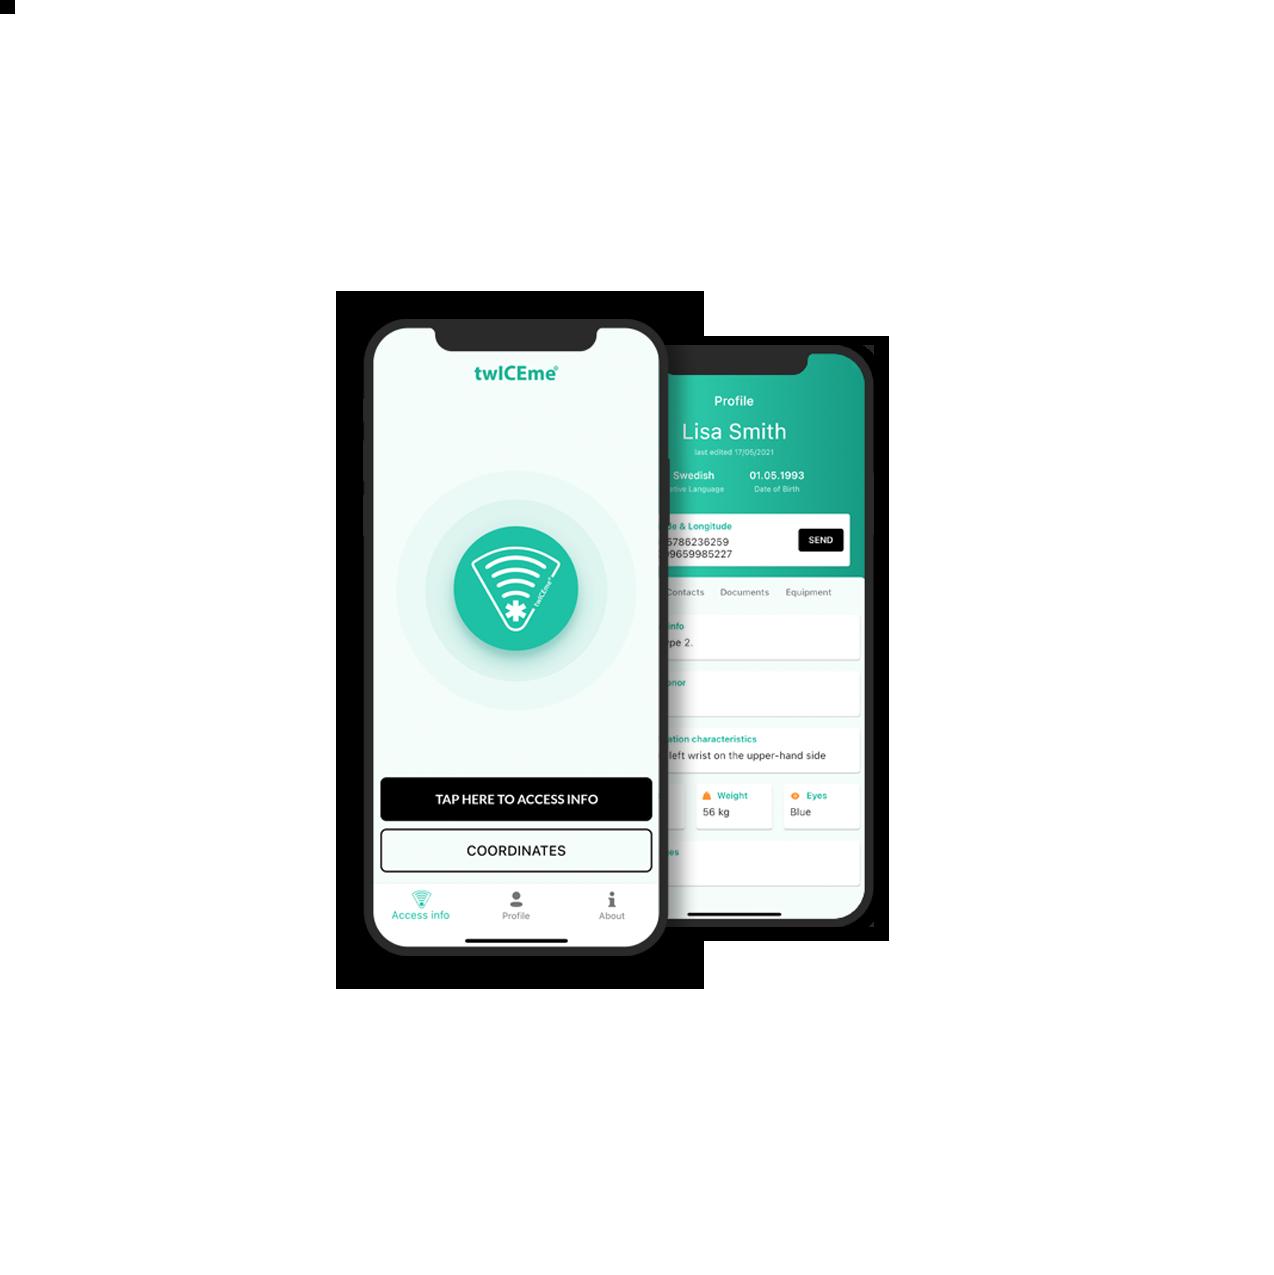 Phones with the twICEme app